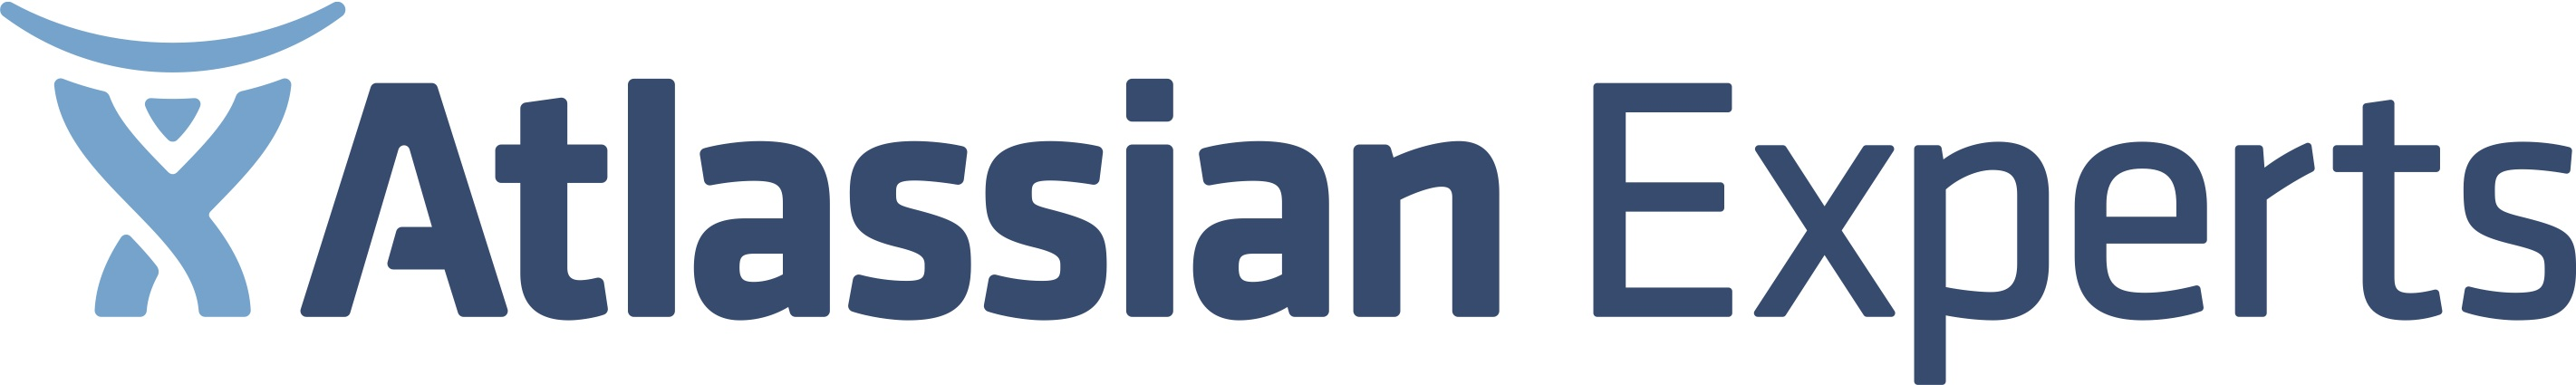 Atlassian Expert